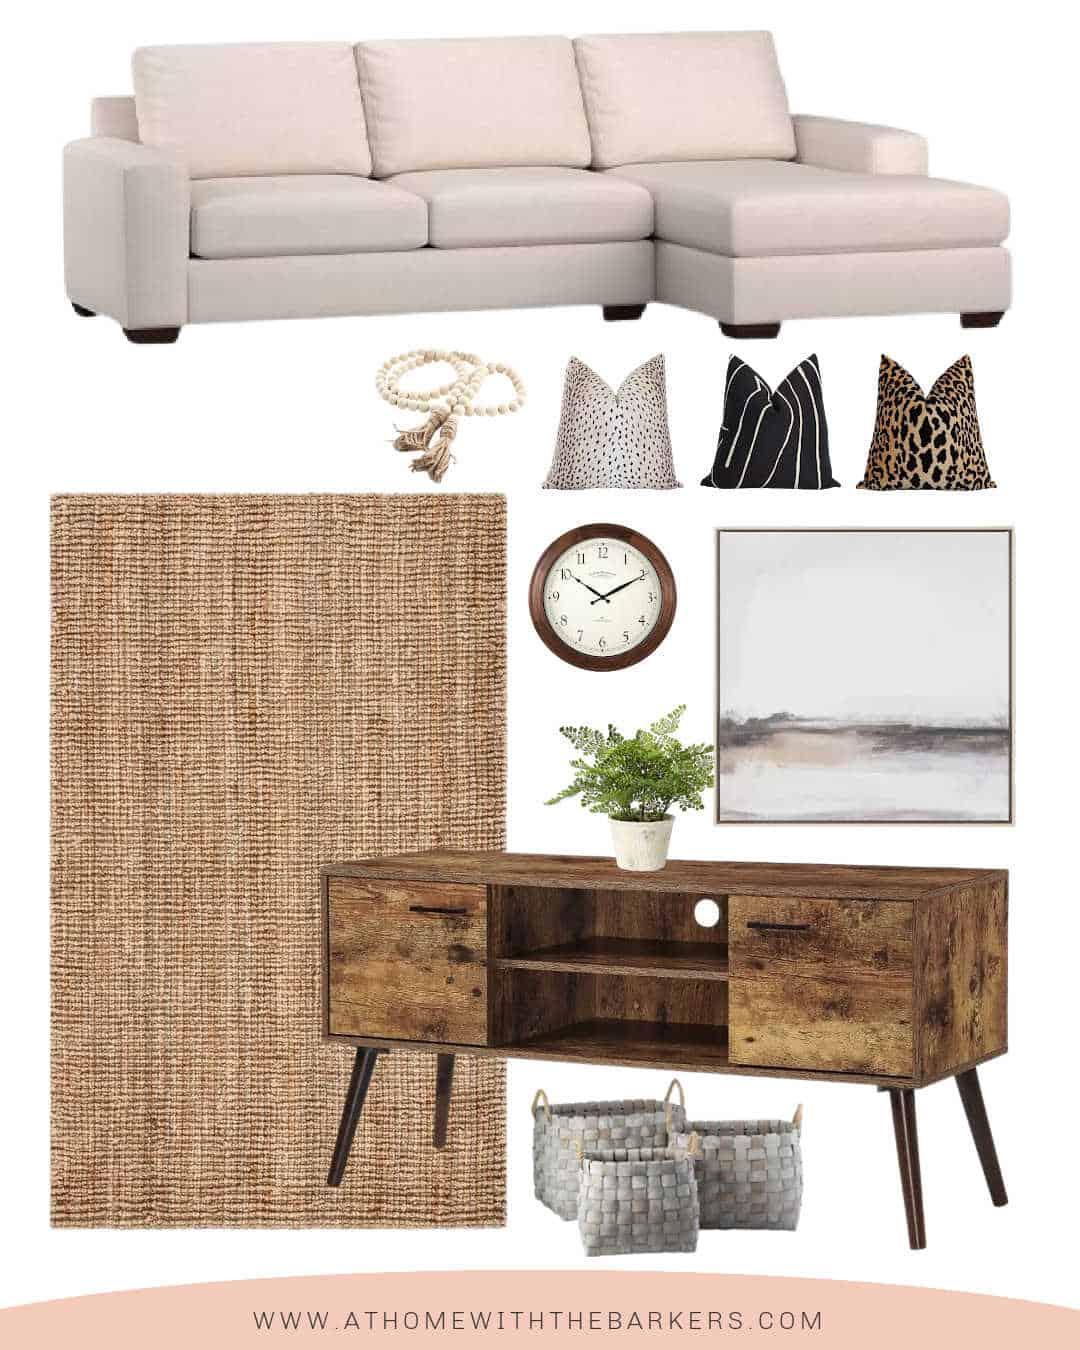 Light Colored Sofa Decorating Ideas plus Shopping Guide